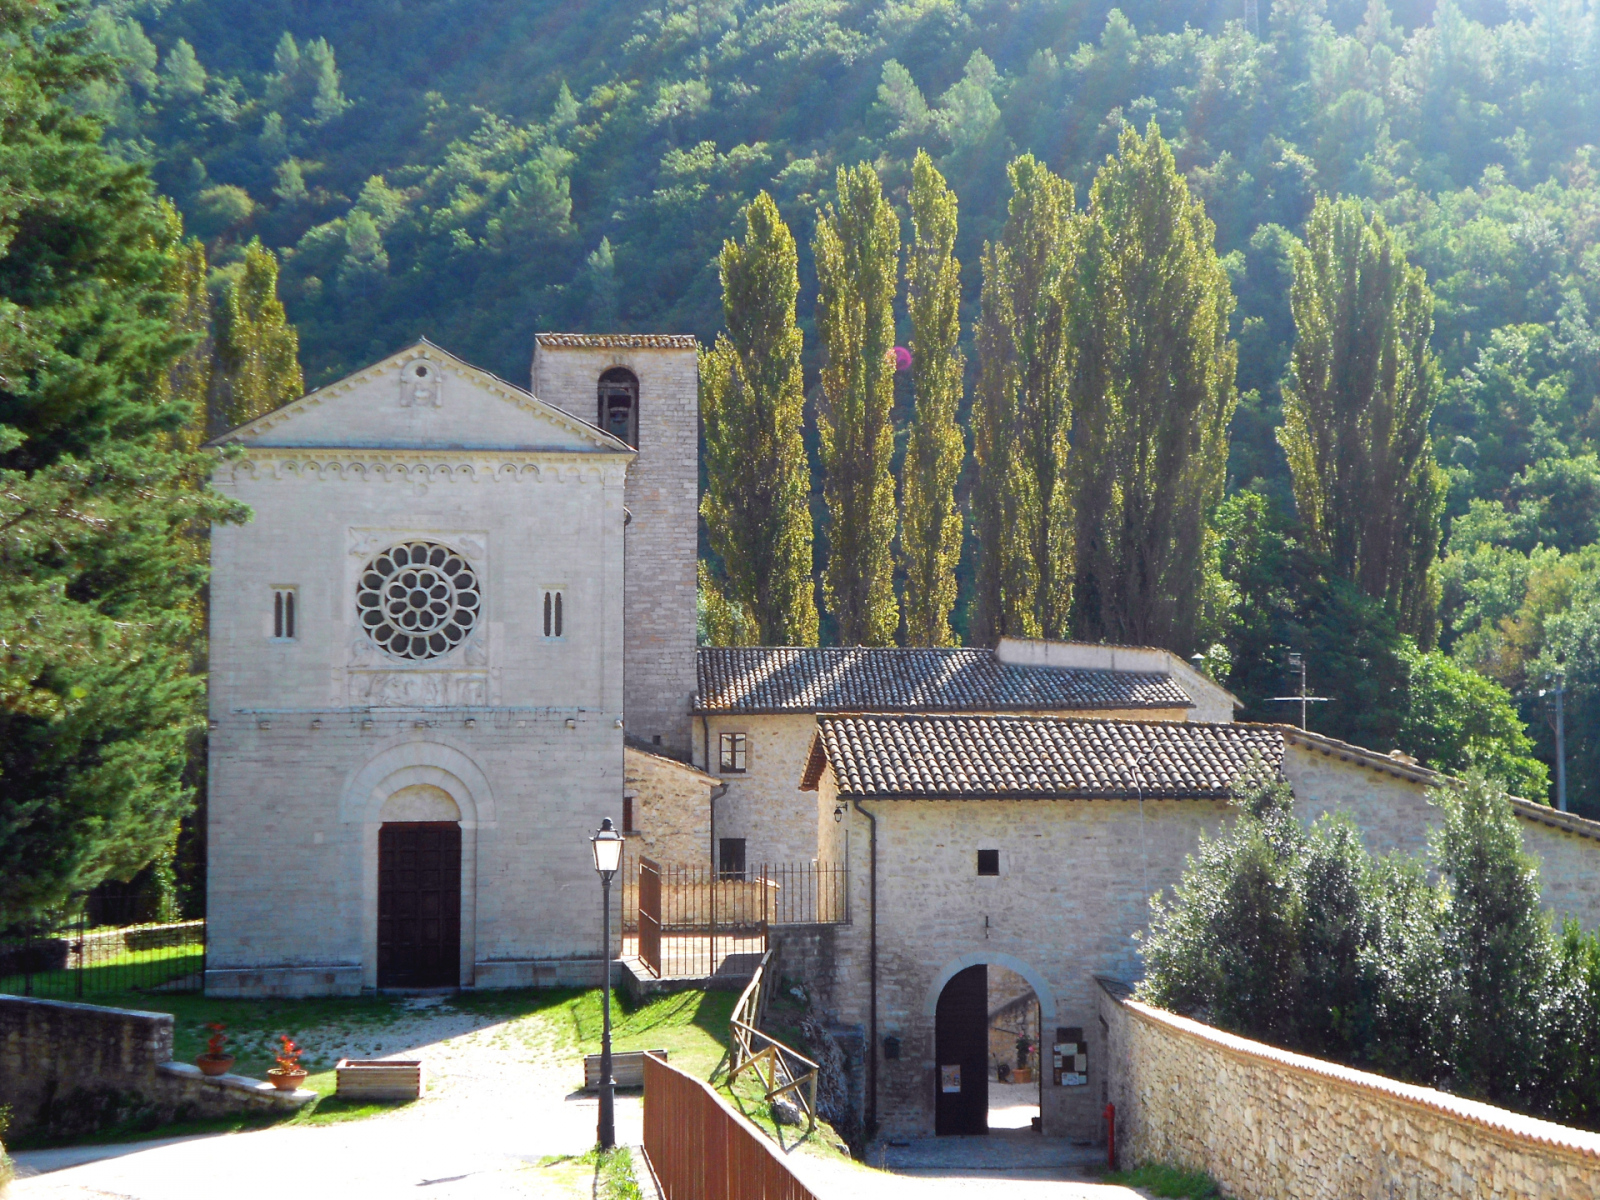 Chiesa di San Felice di Narco - esterno - Castel San Felice